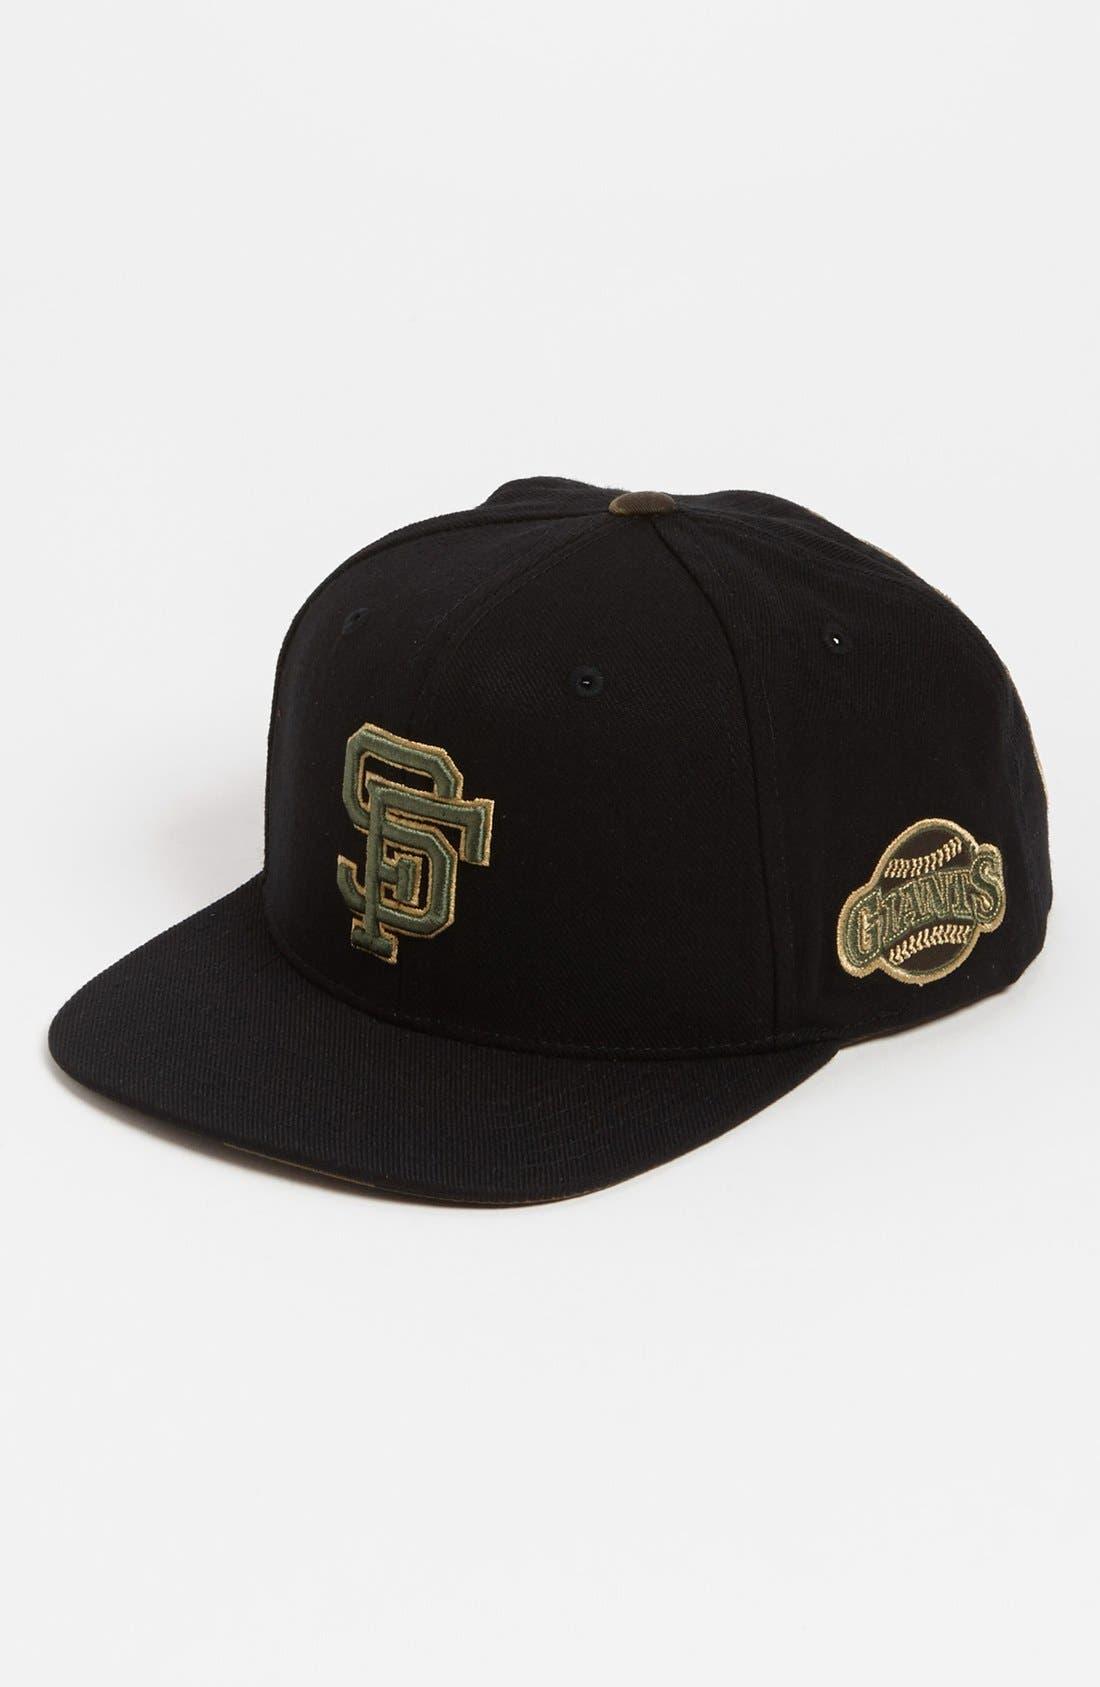 Main Image - American Needle 'San Francisco Giants - Blockhead Camo' Snapback Baseball Cap